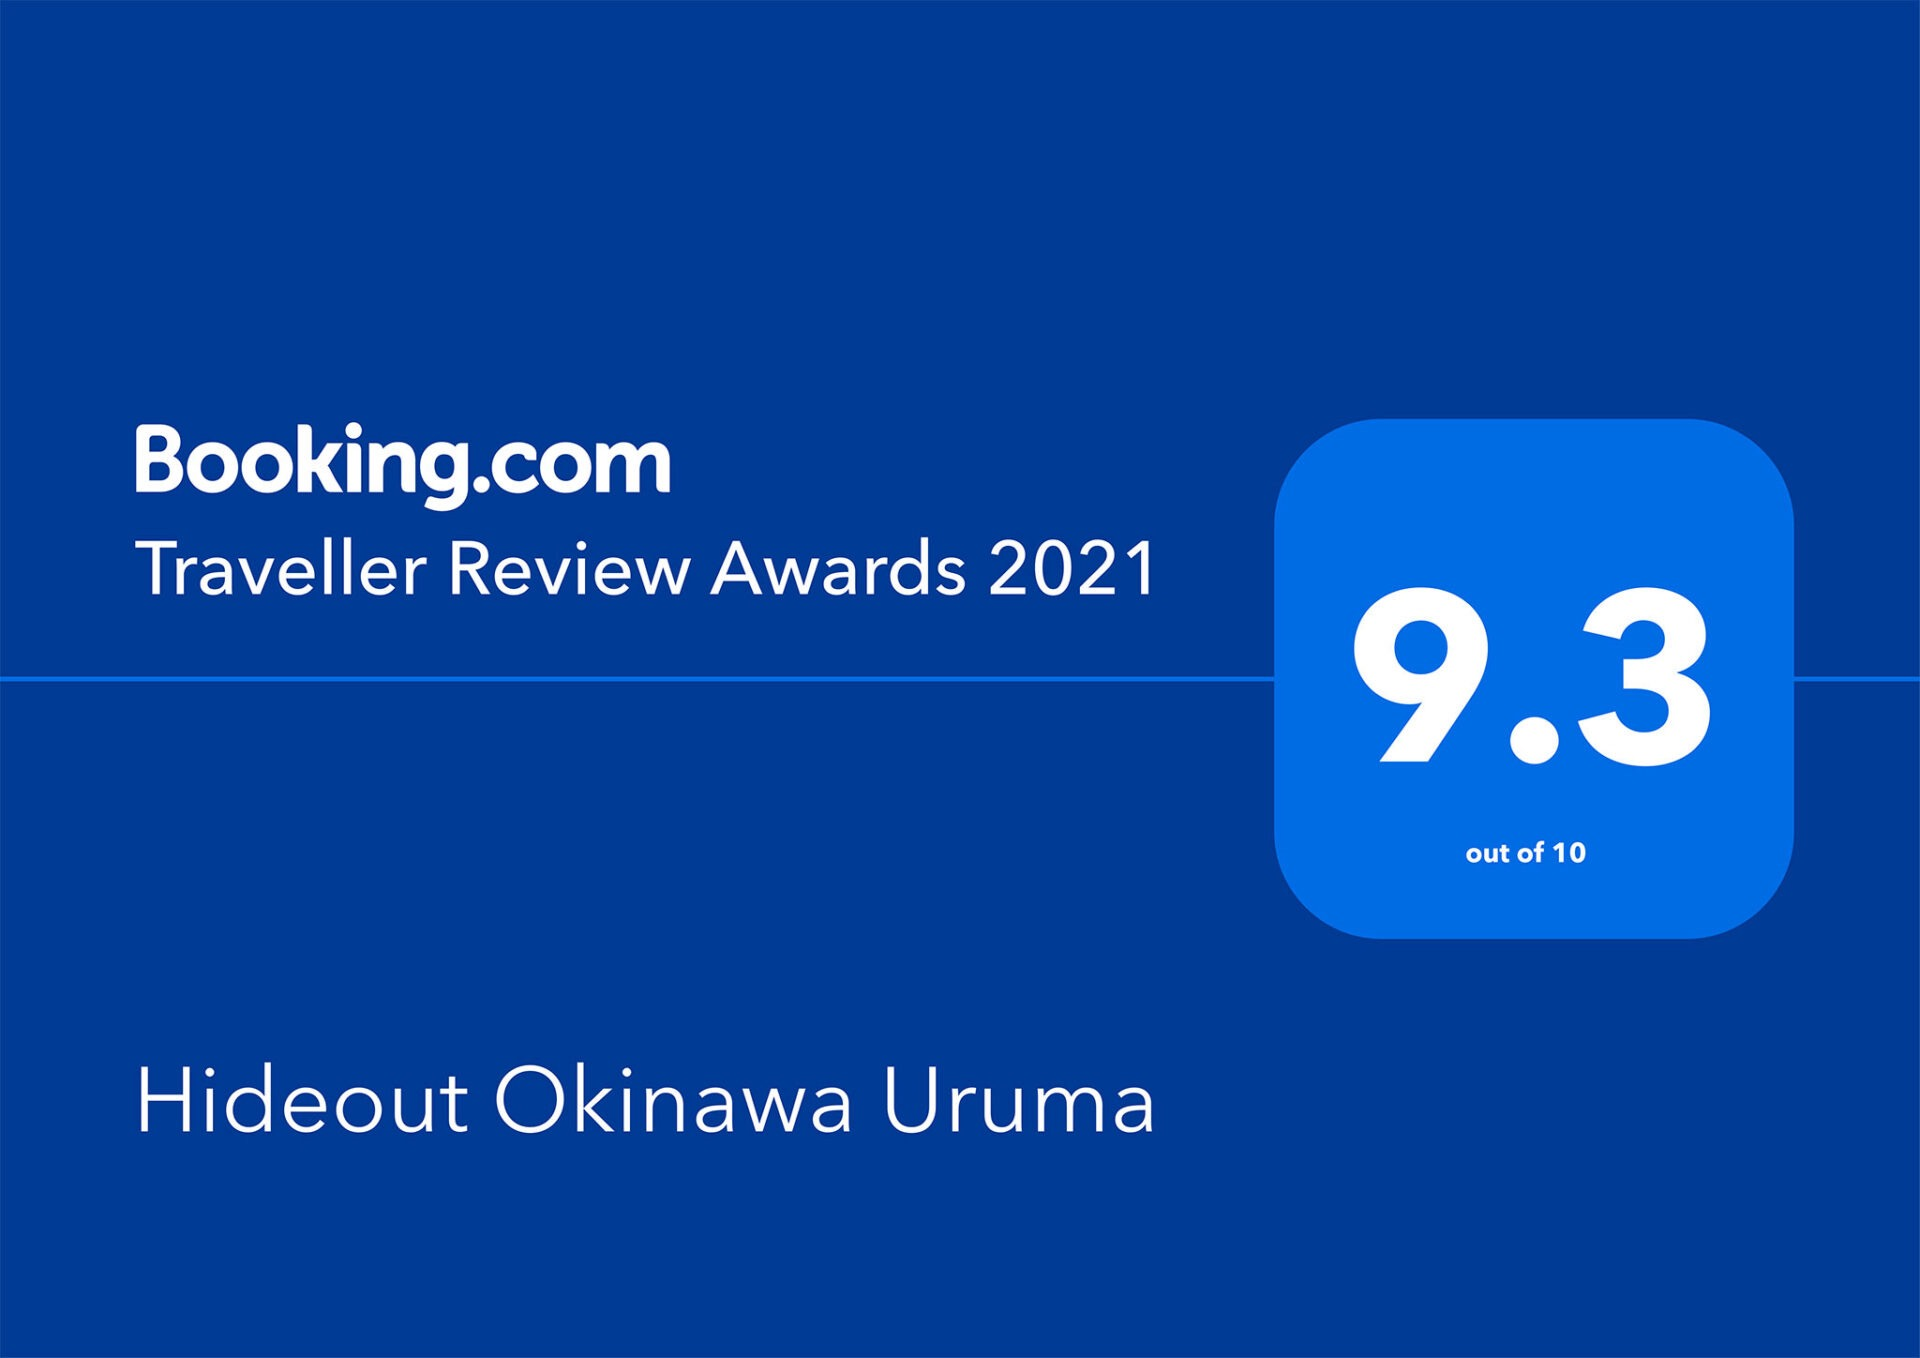 Booking.com Traveller Review Awards 2021